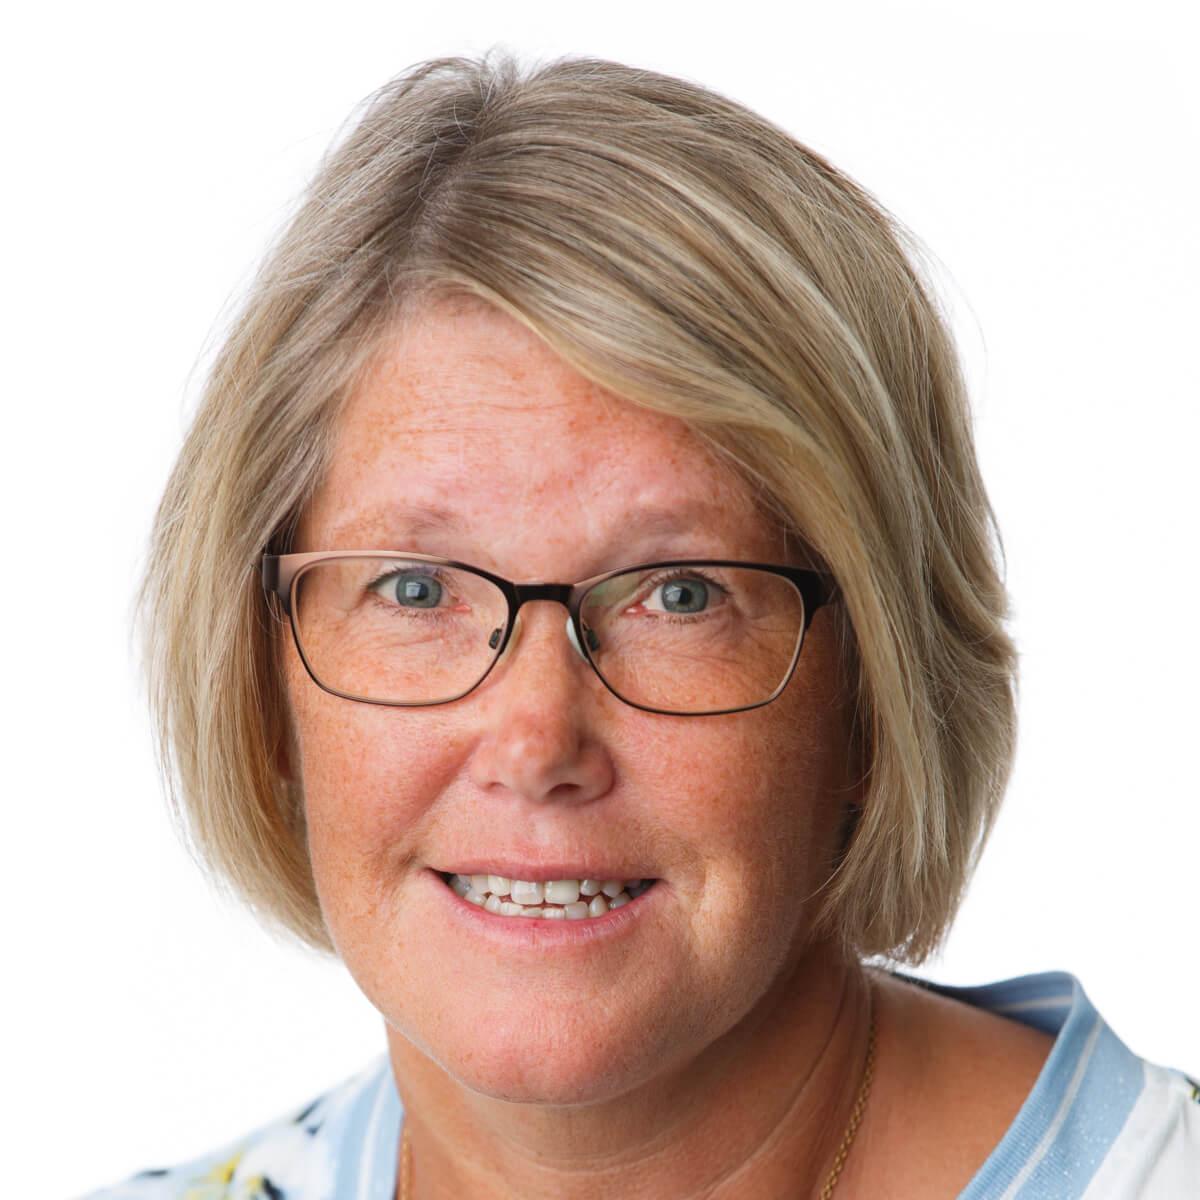 Anita Holmlund